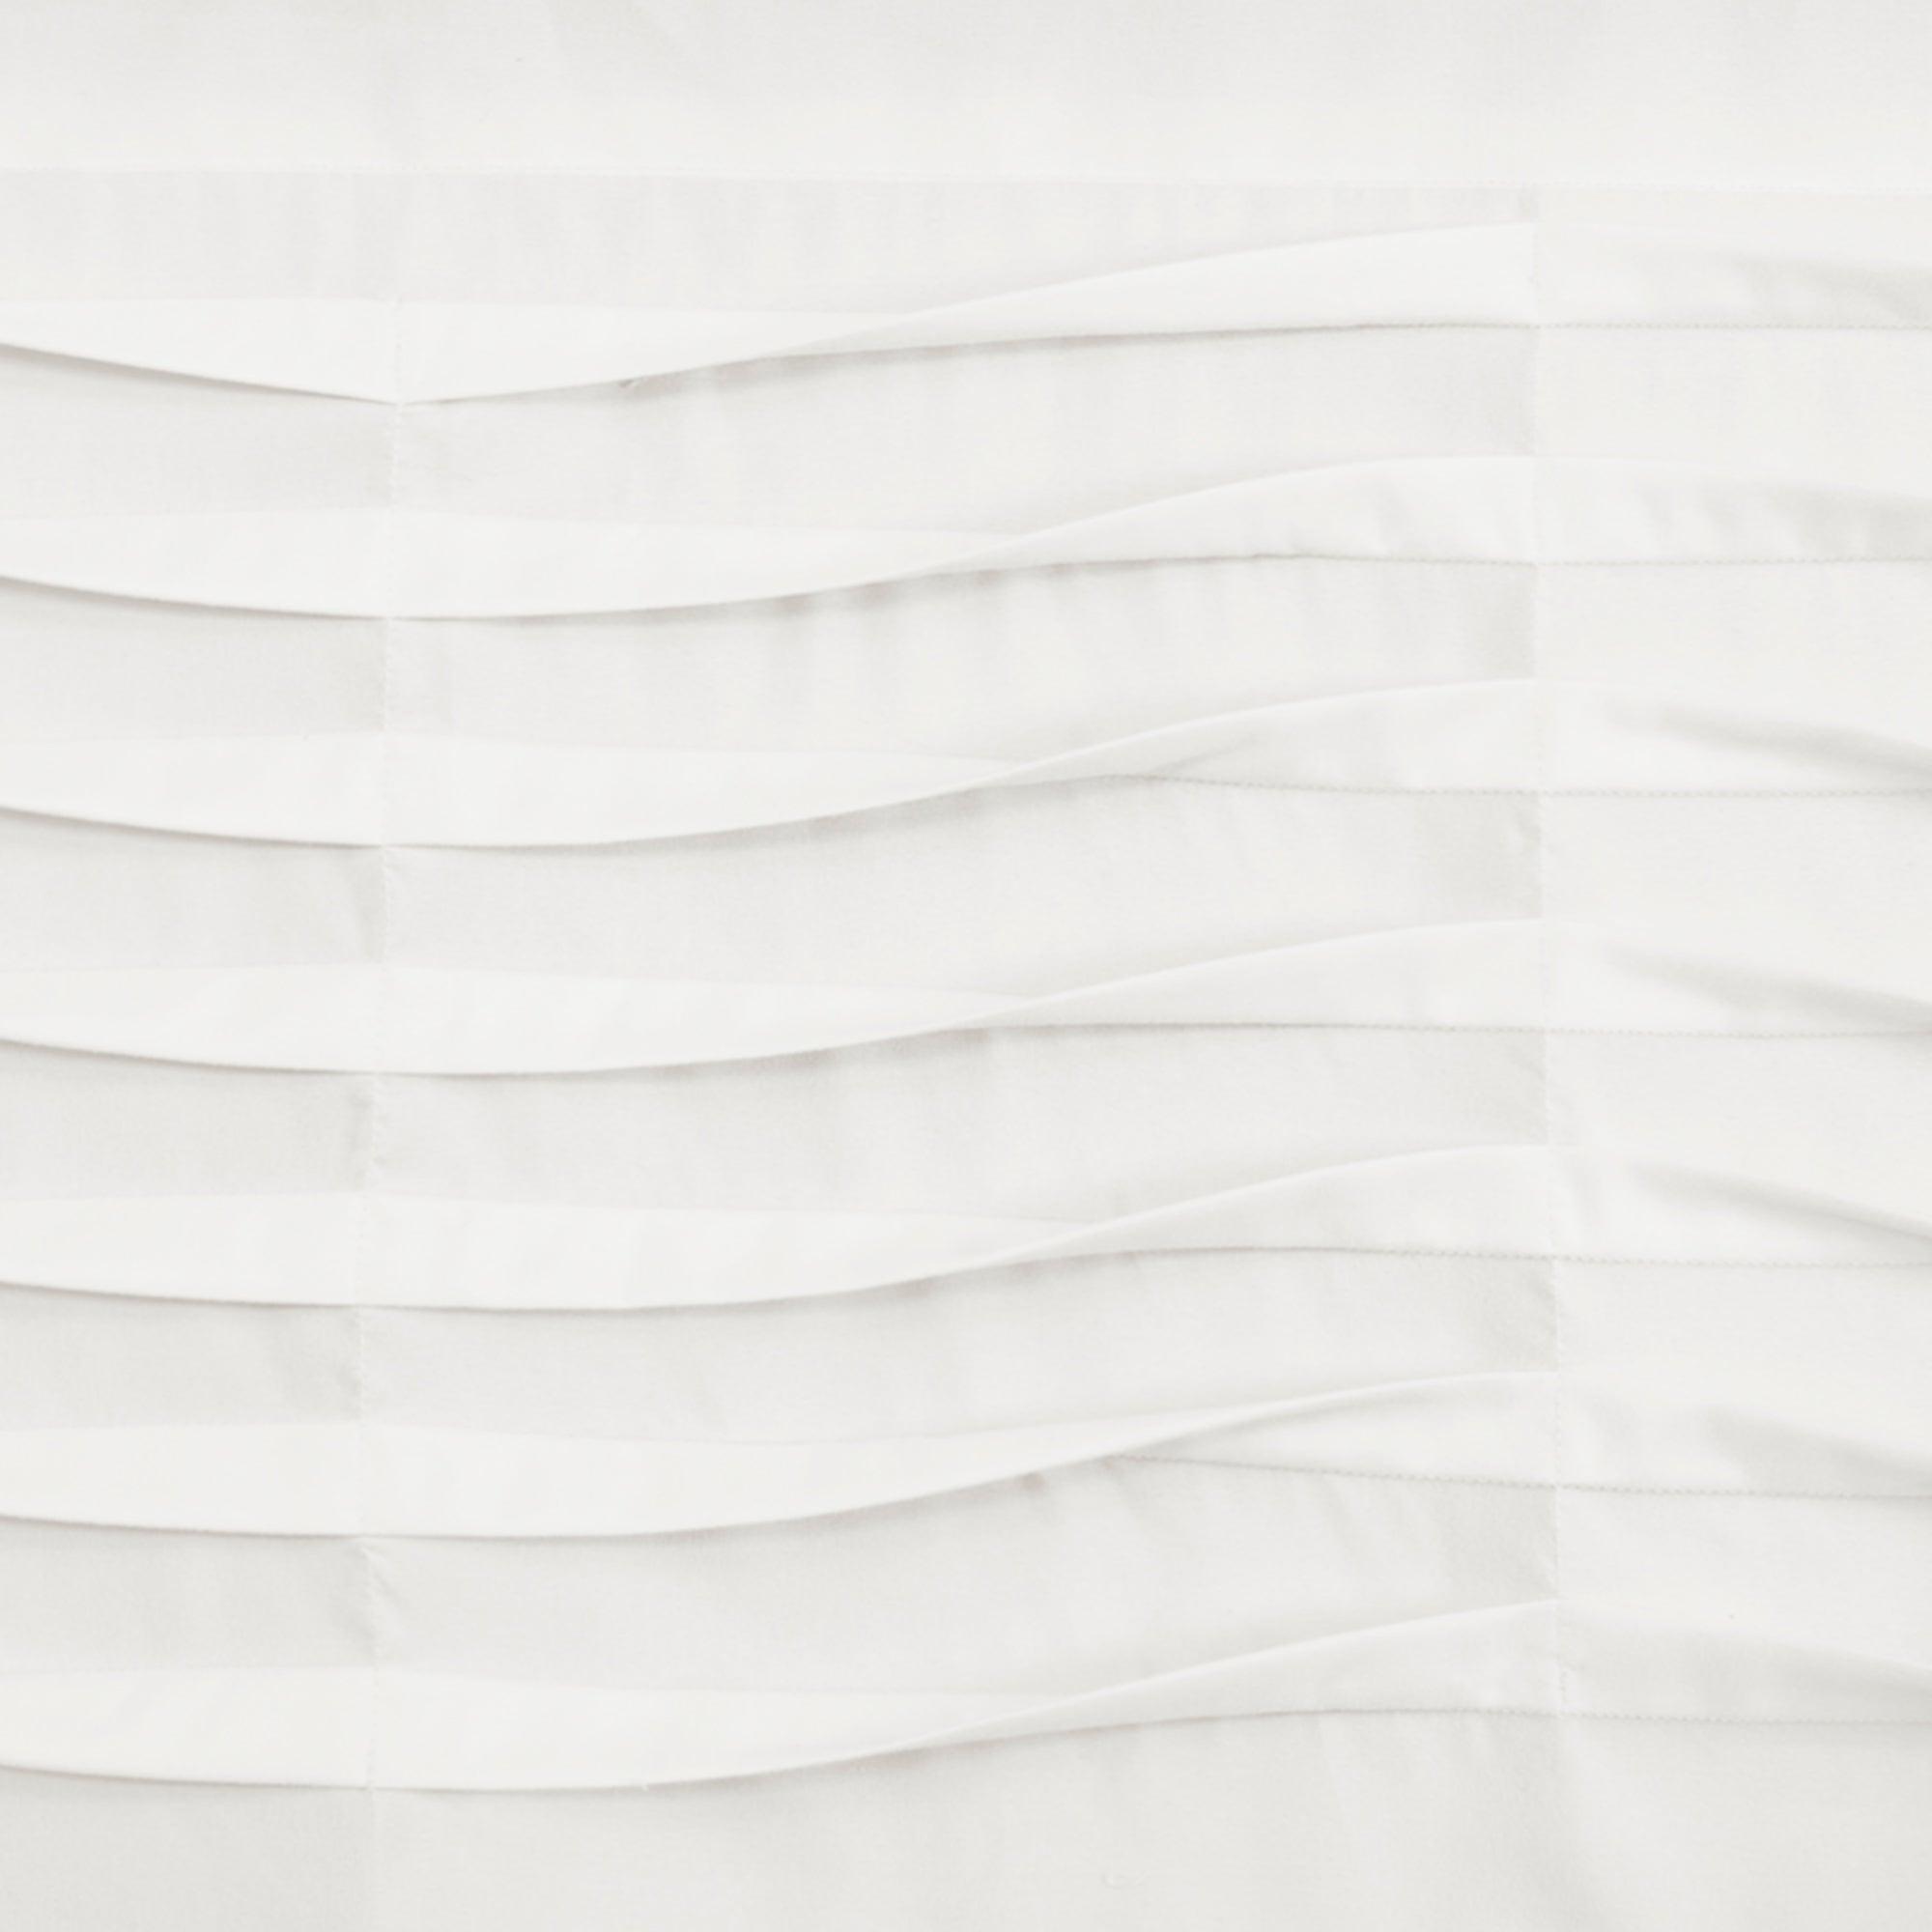 Most Popular Details About Porch & Den Kinnaman Wave Texture Window Curtain Valance Regarding Porch & Den Lorentz Silver 24 Inch Tier Pairs (Gallery 14 of 20)